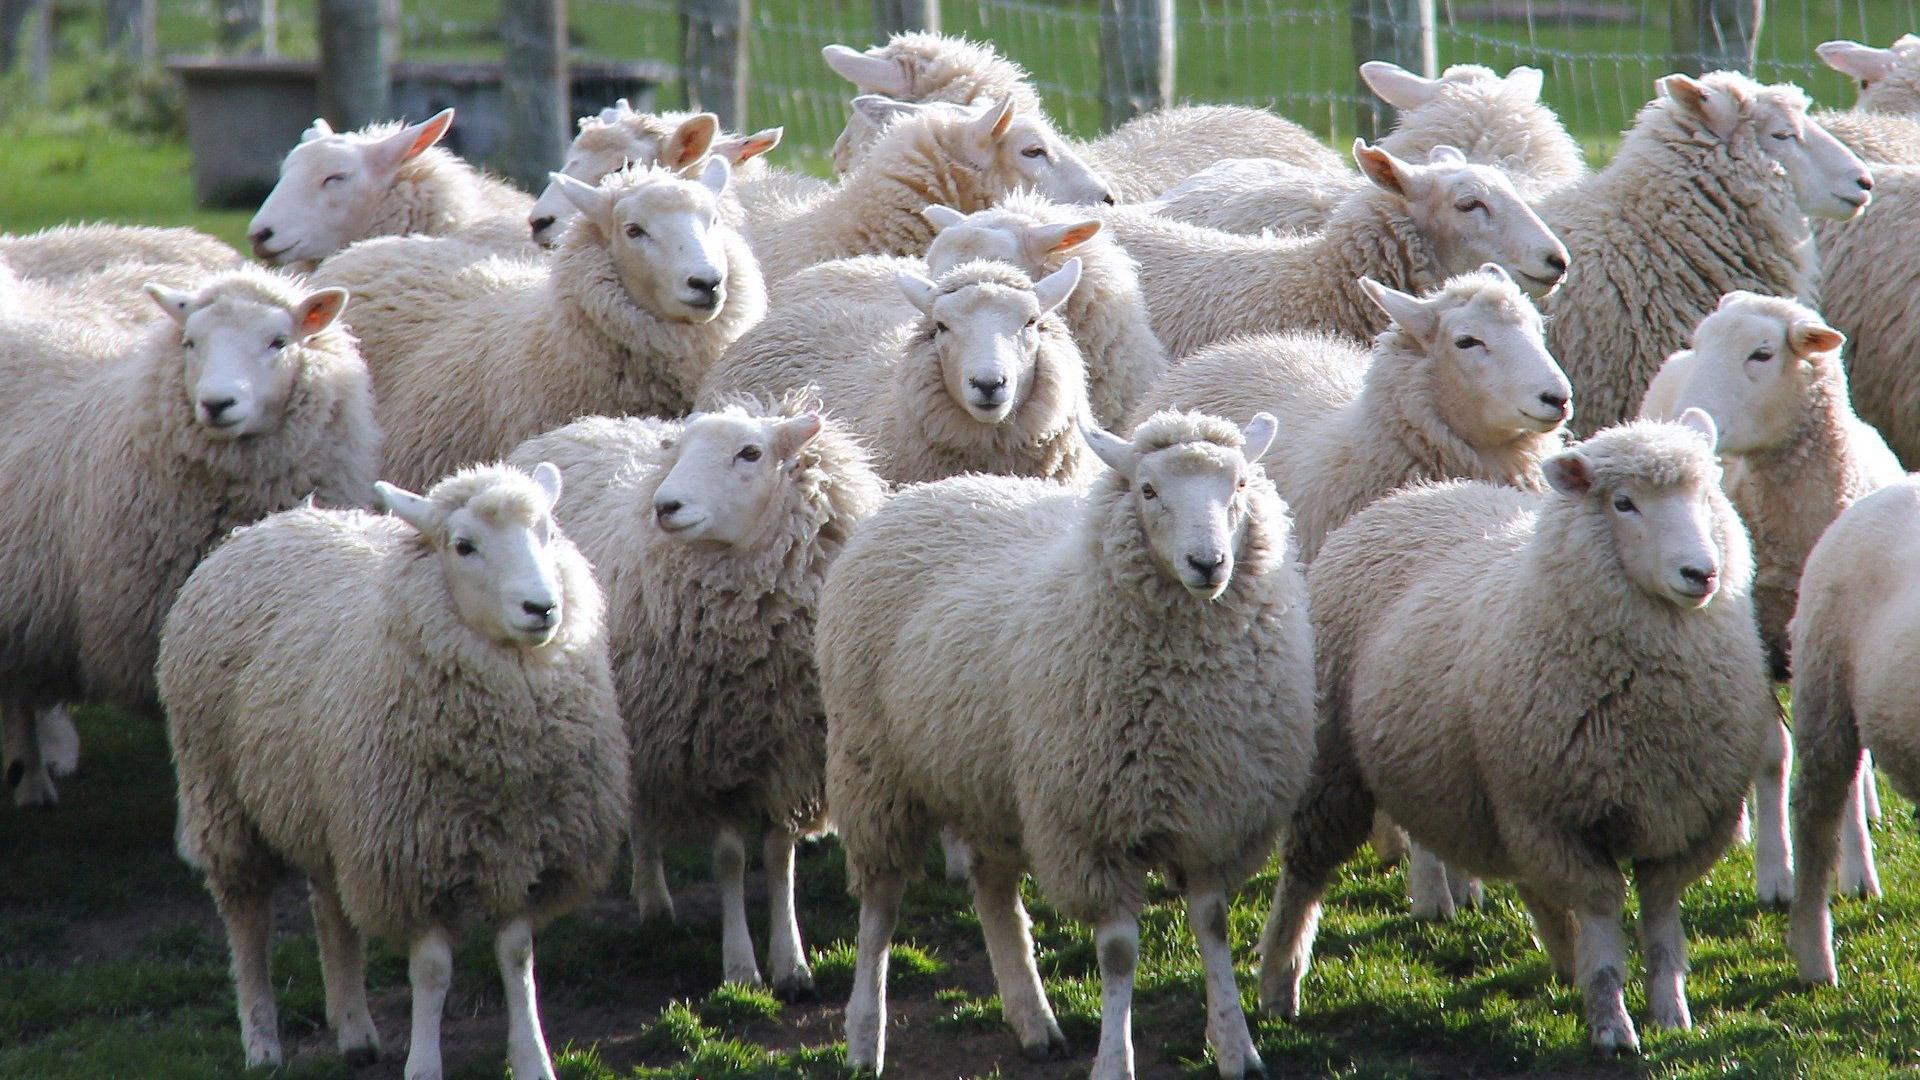 Sheep farm on New Zealand's South Island